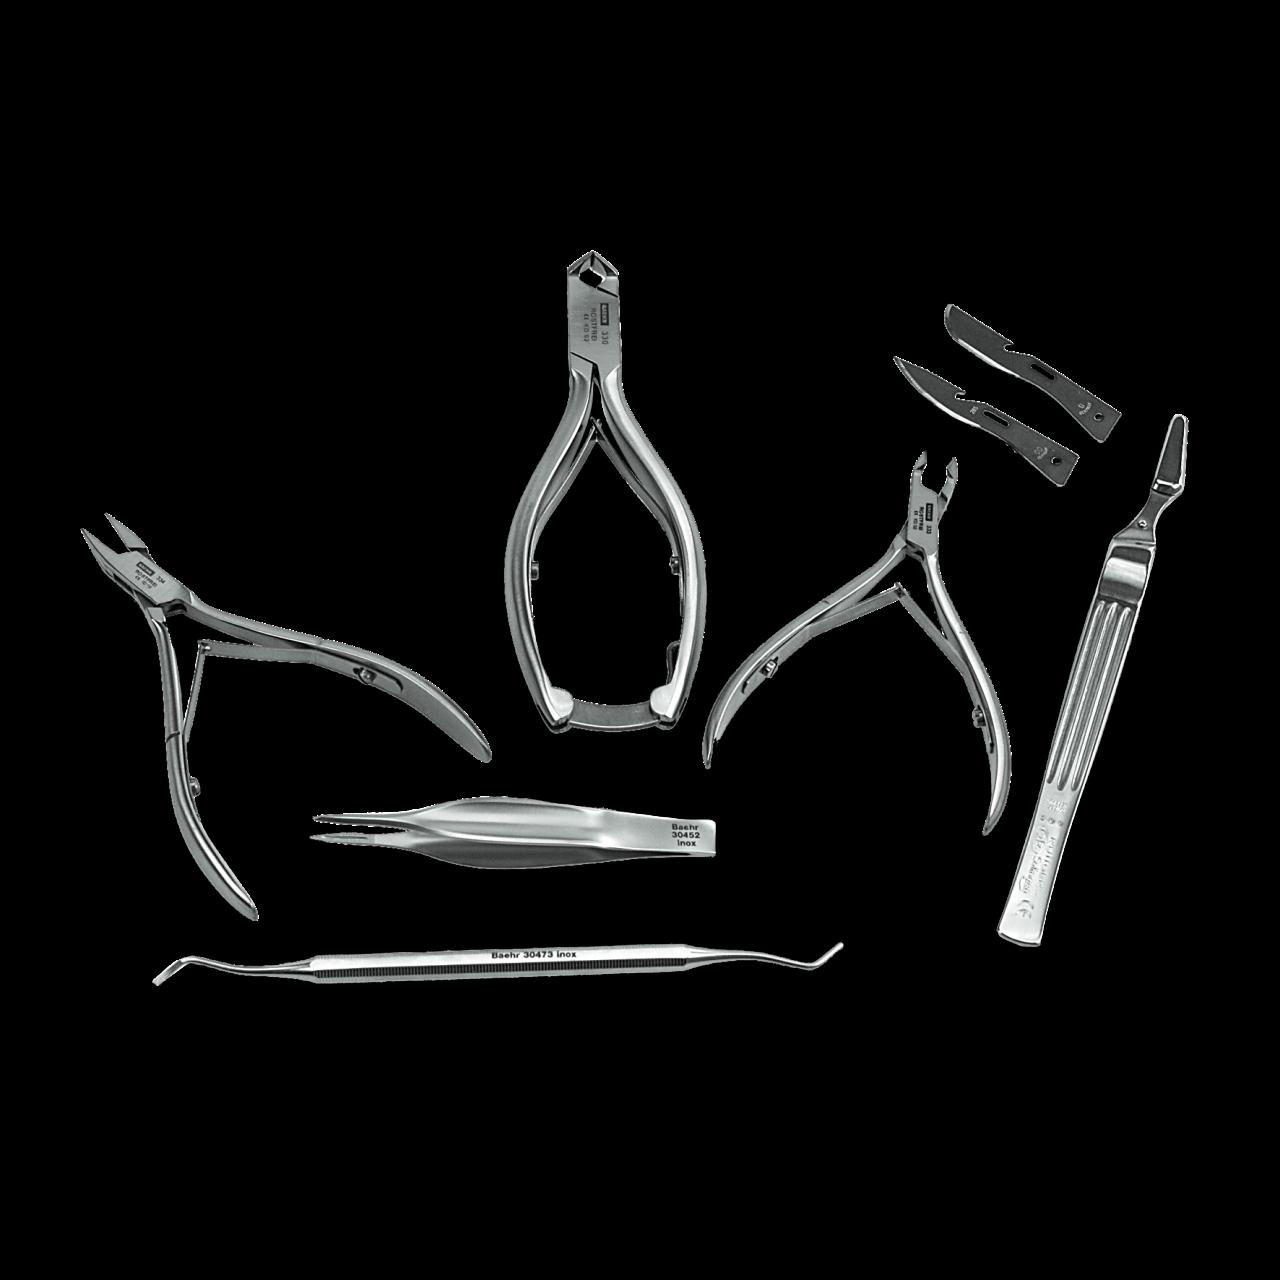 Basis-Instrumentensatz Edelstahl